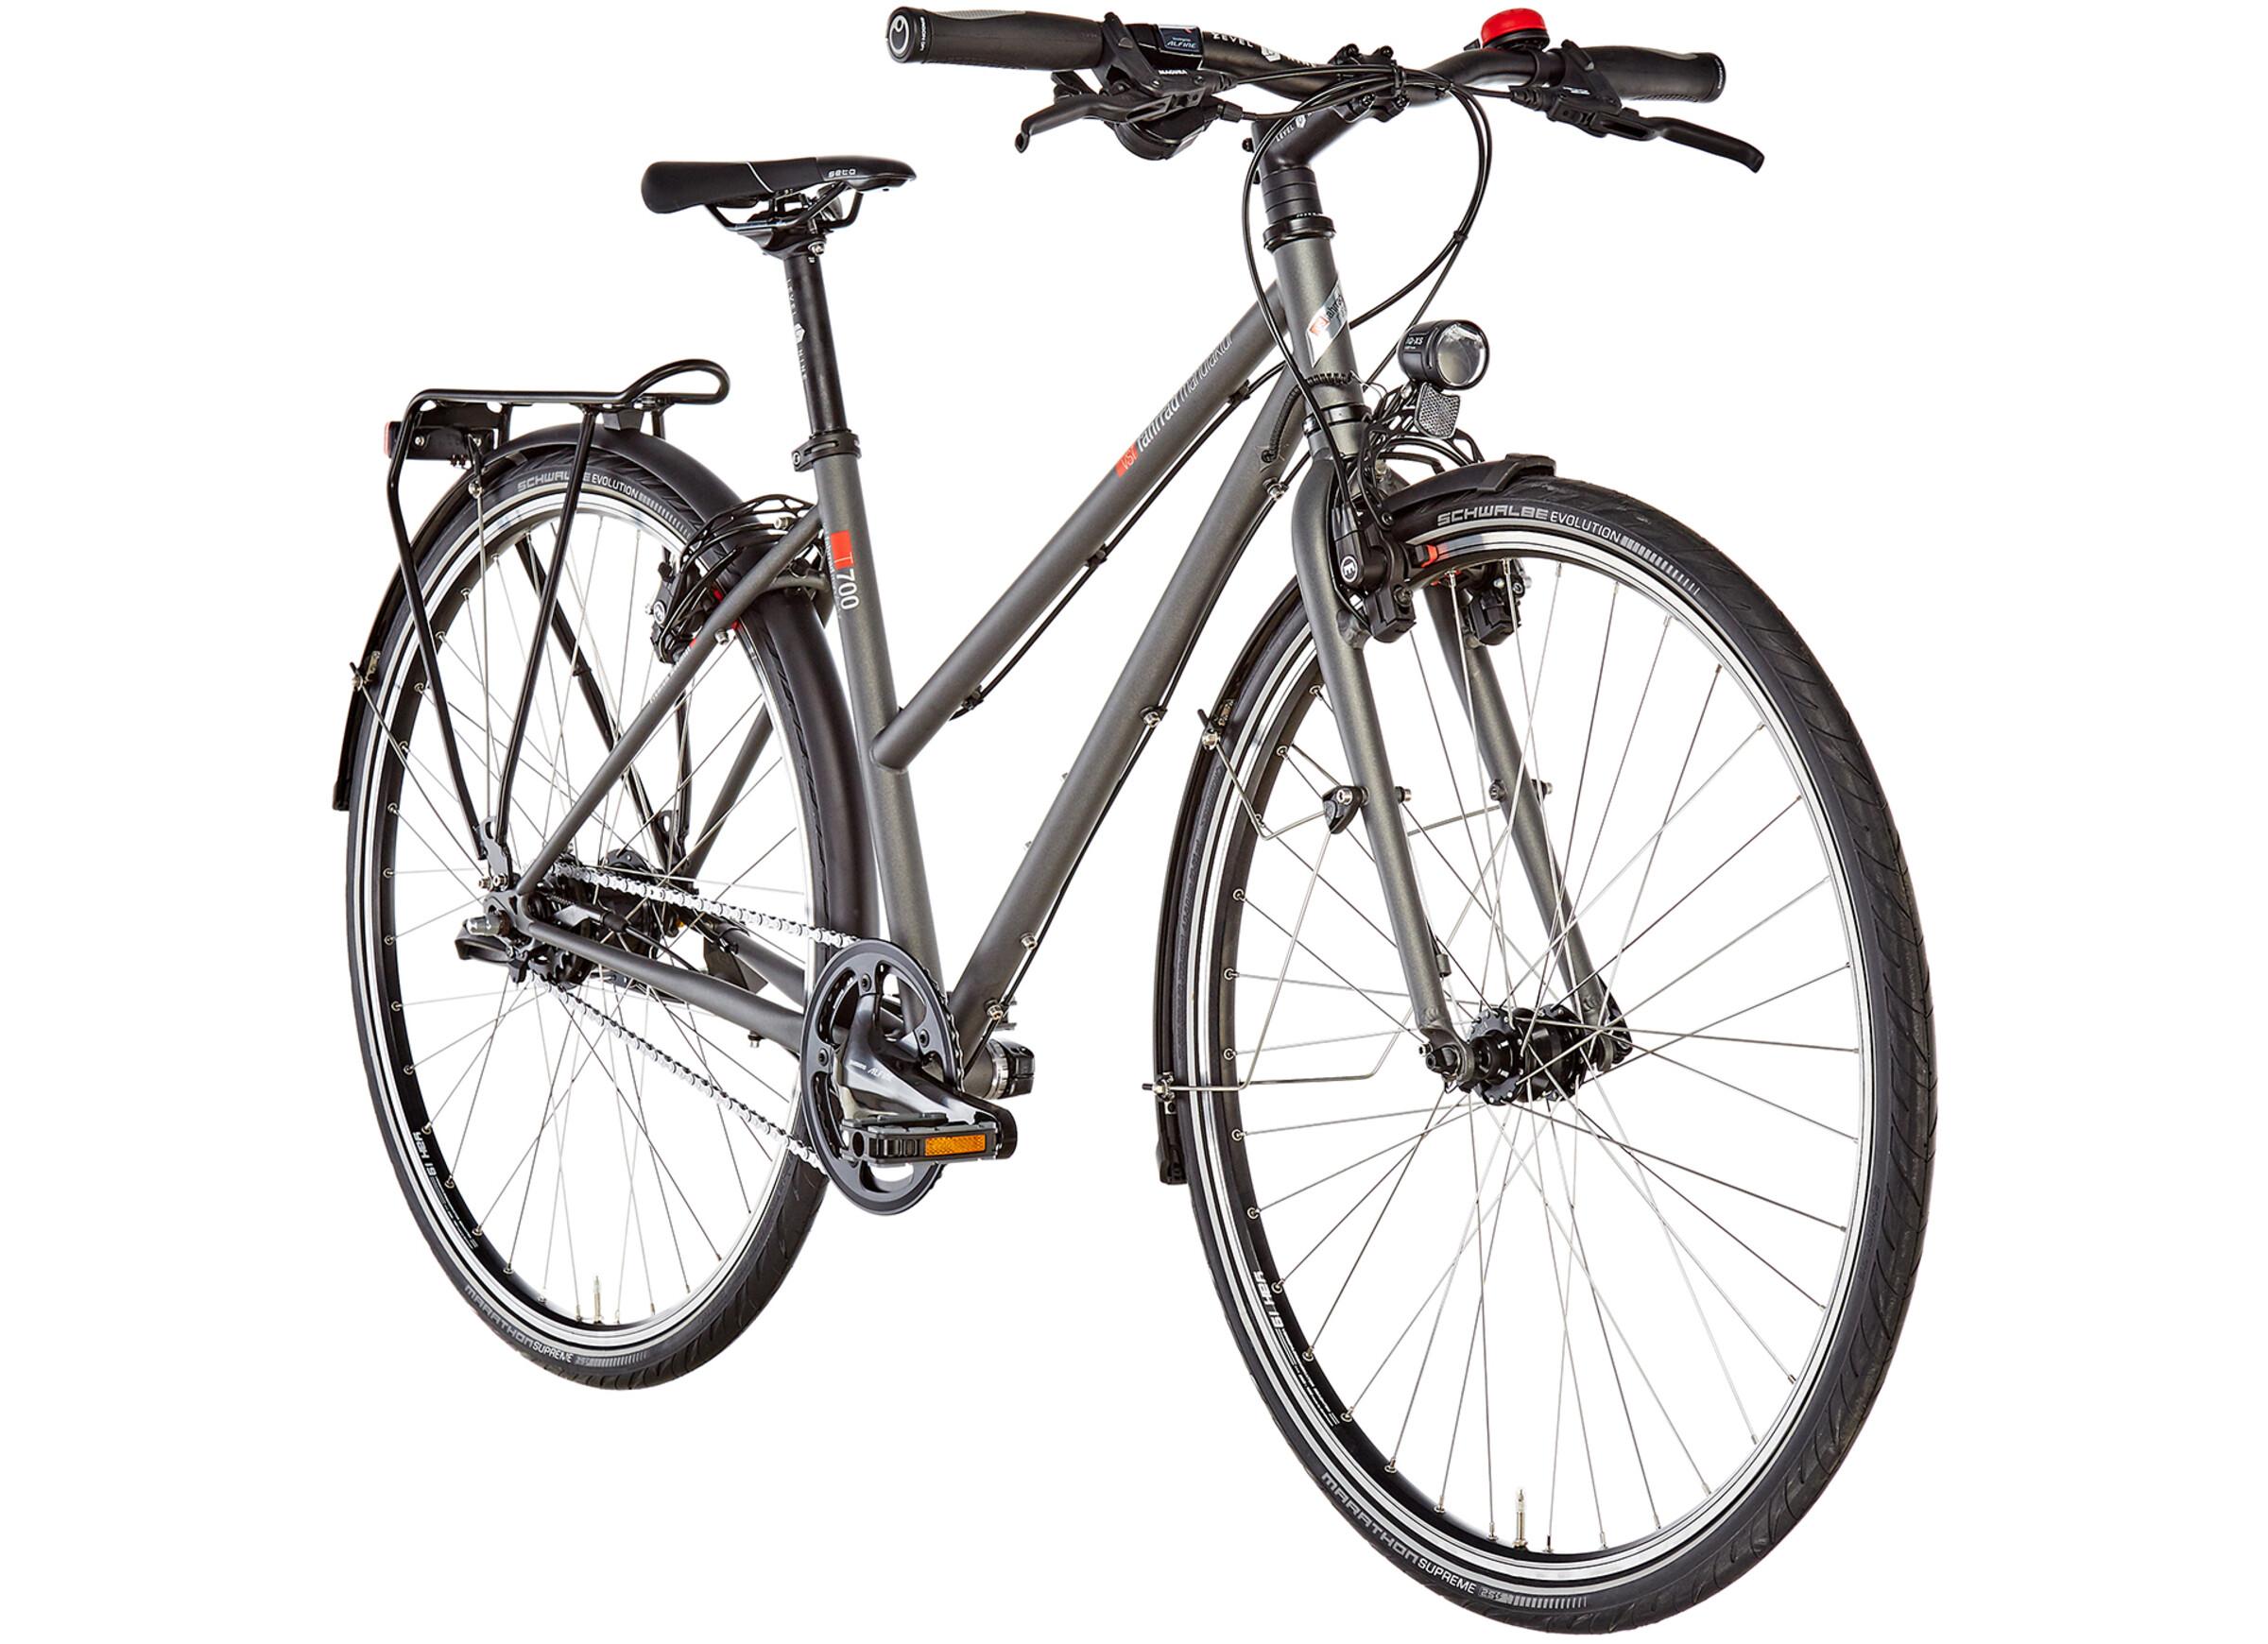 vsf fahrradmanufaktur T-700 toerfiets Diamant Alfine 11